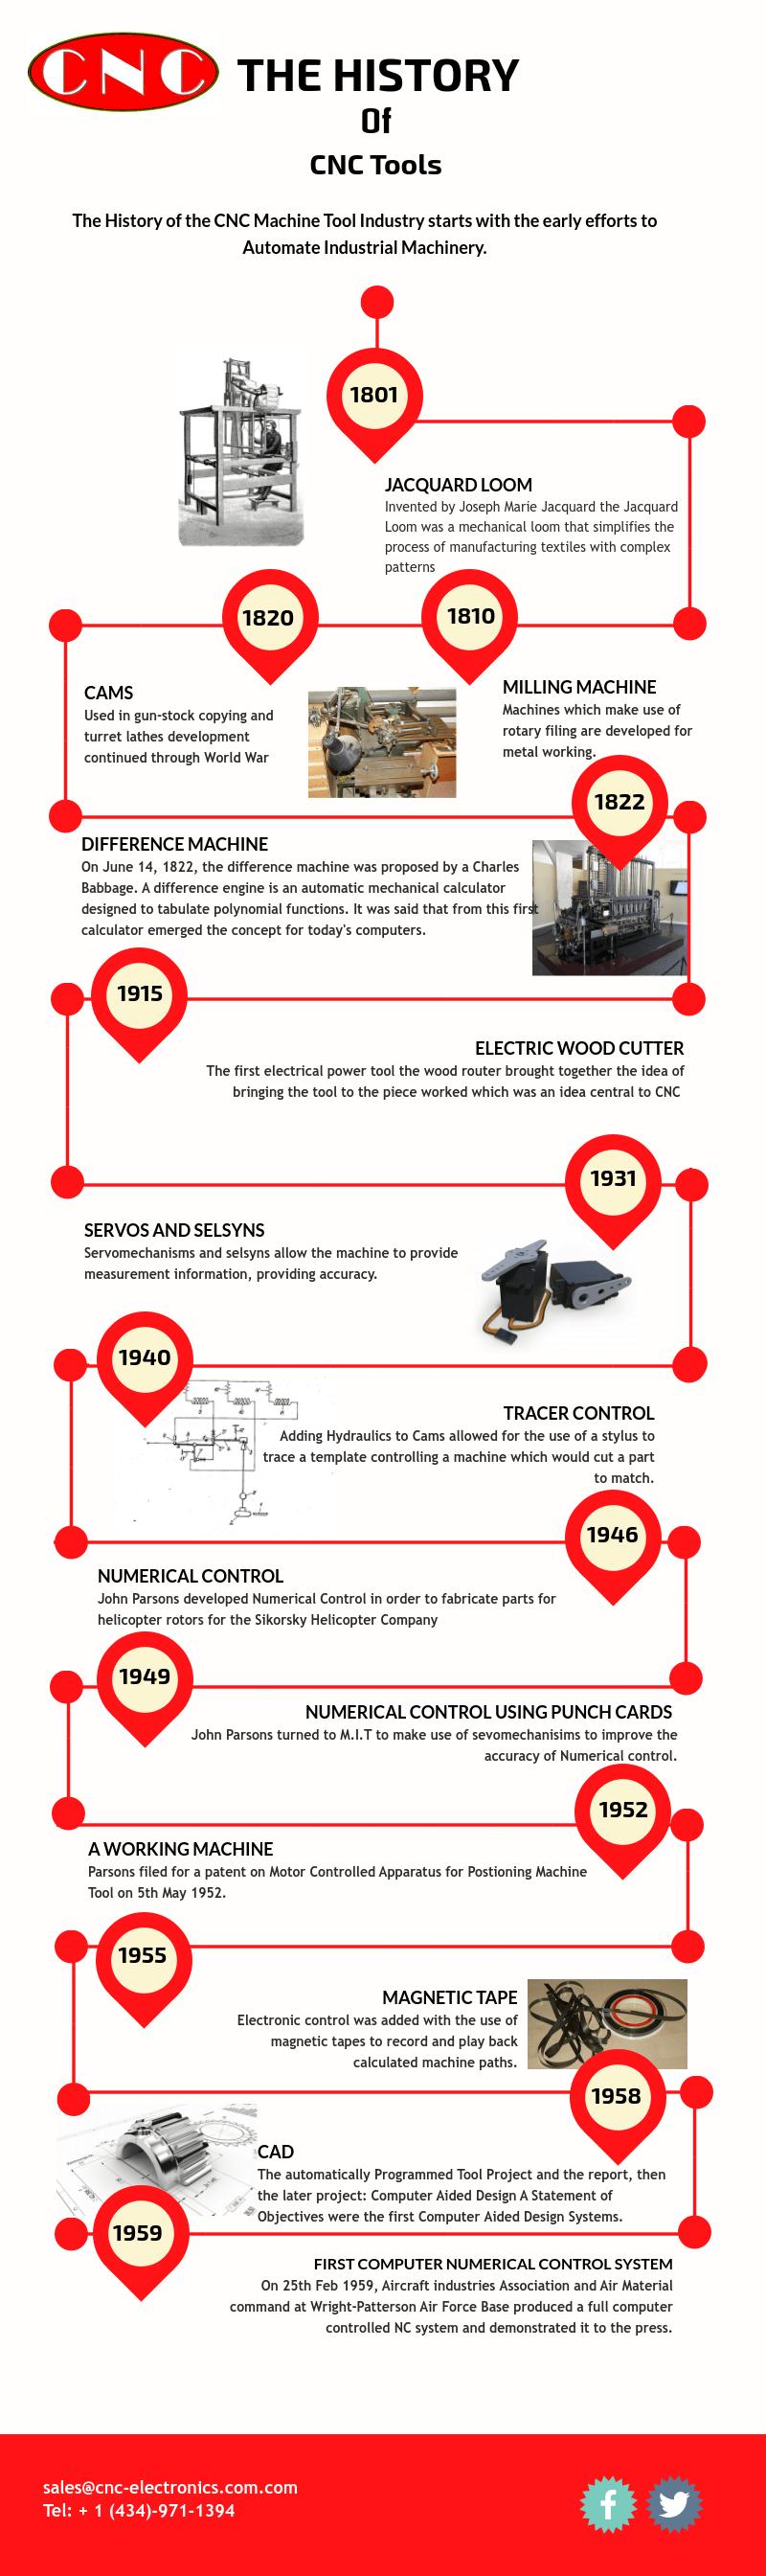 History Cnc Machine Tools Pt 1 1801 1959 Infographic Summary